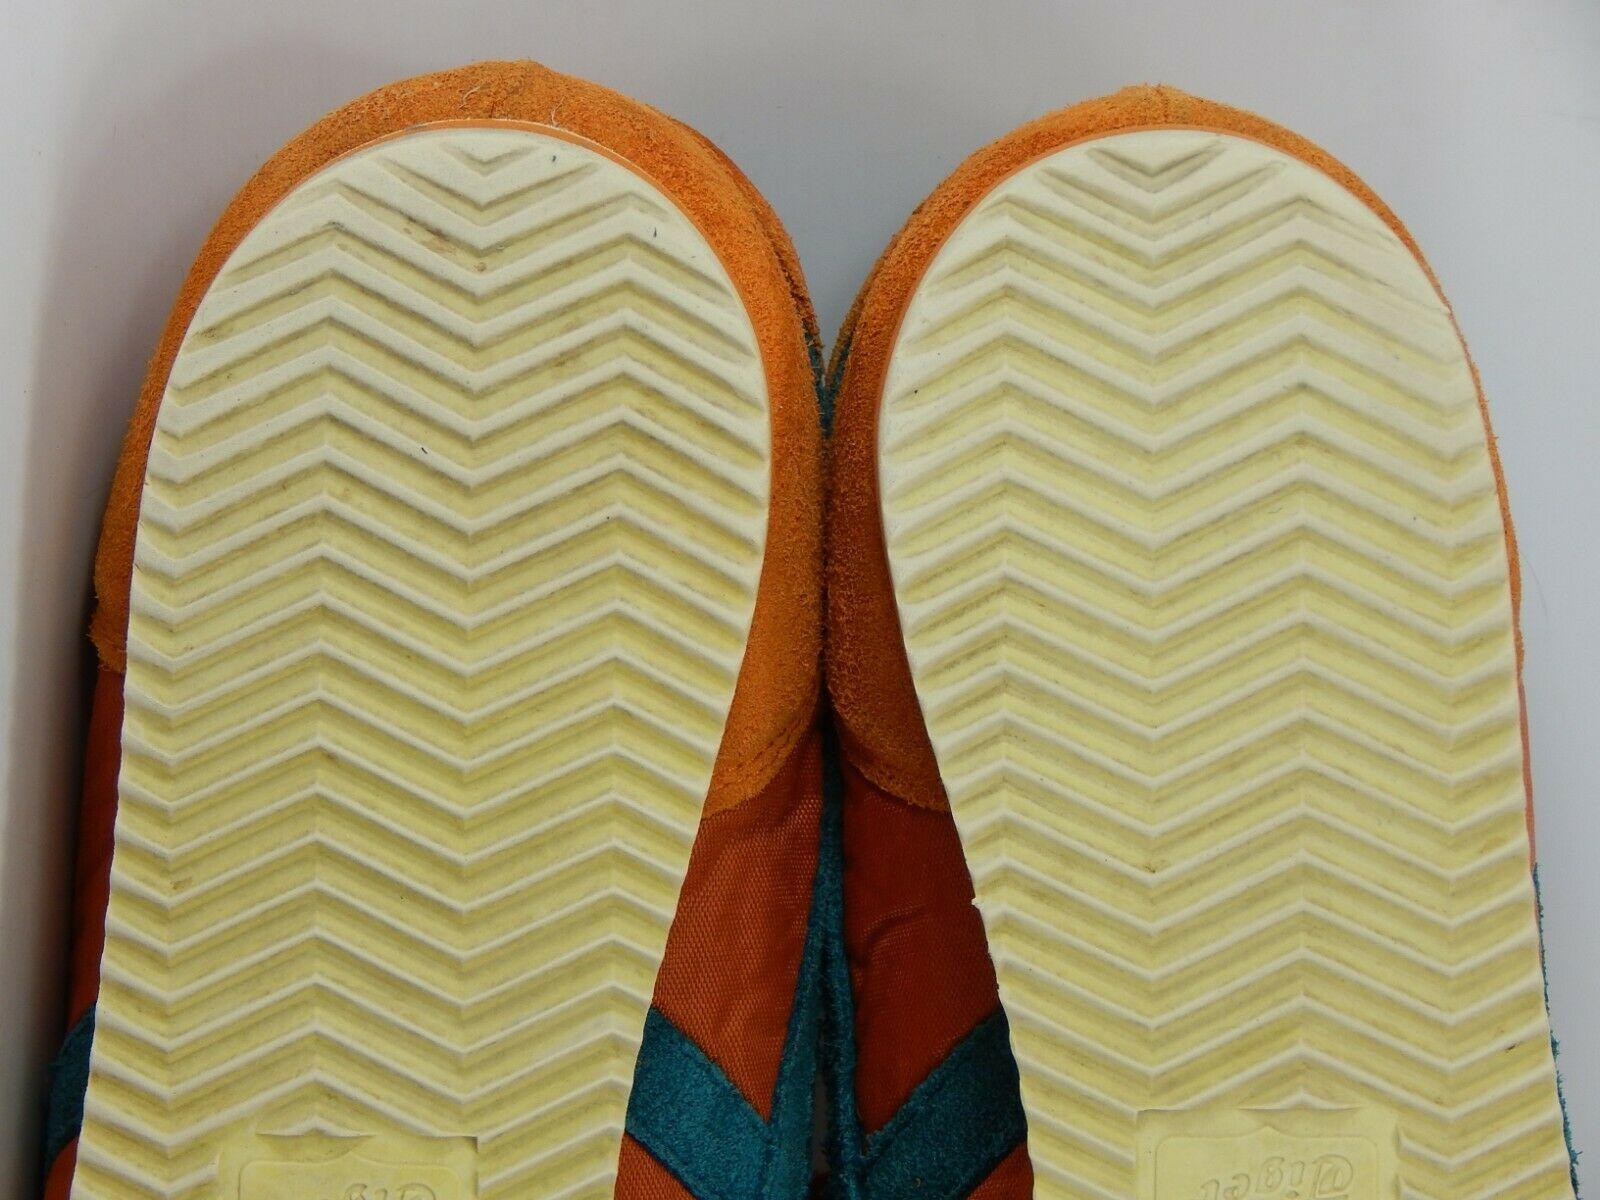 Asics Onitsuka Tiger Corsair Vin Taglia US 9 M (D) 42.5 Uomo Scarpe Sneakers